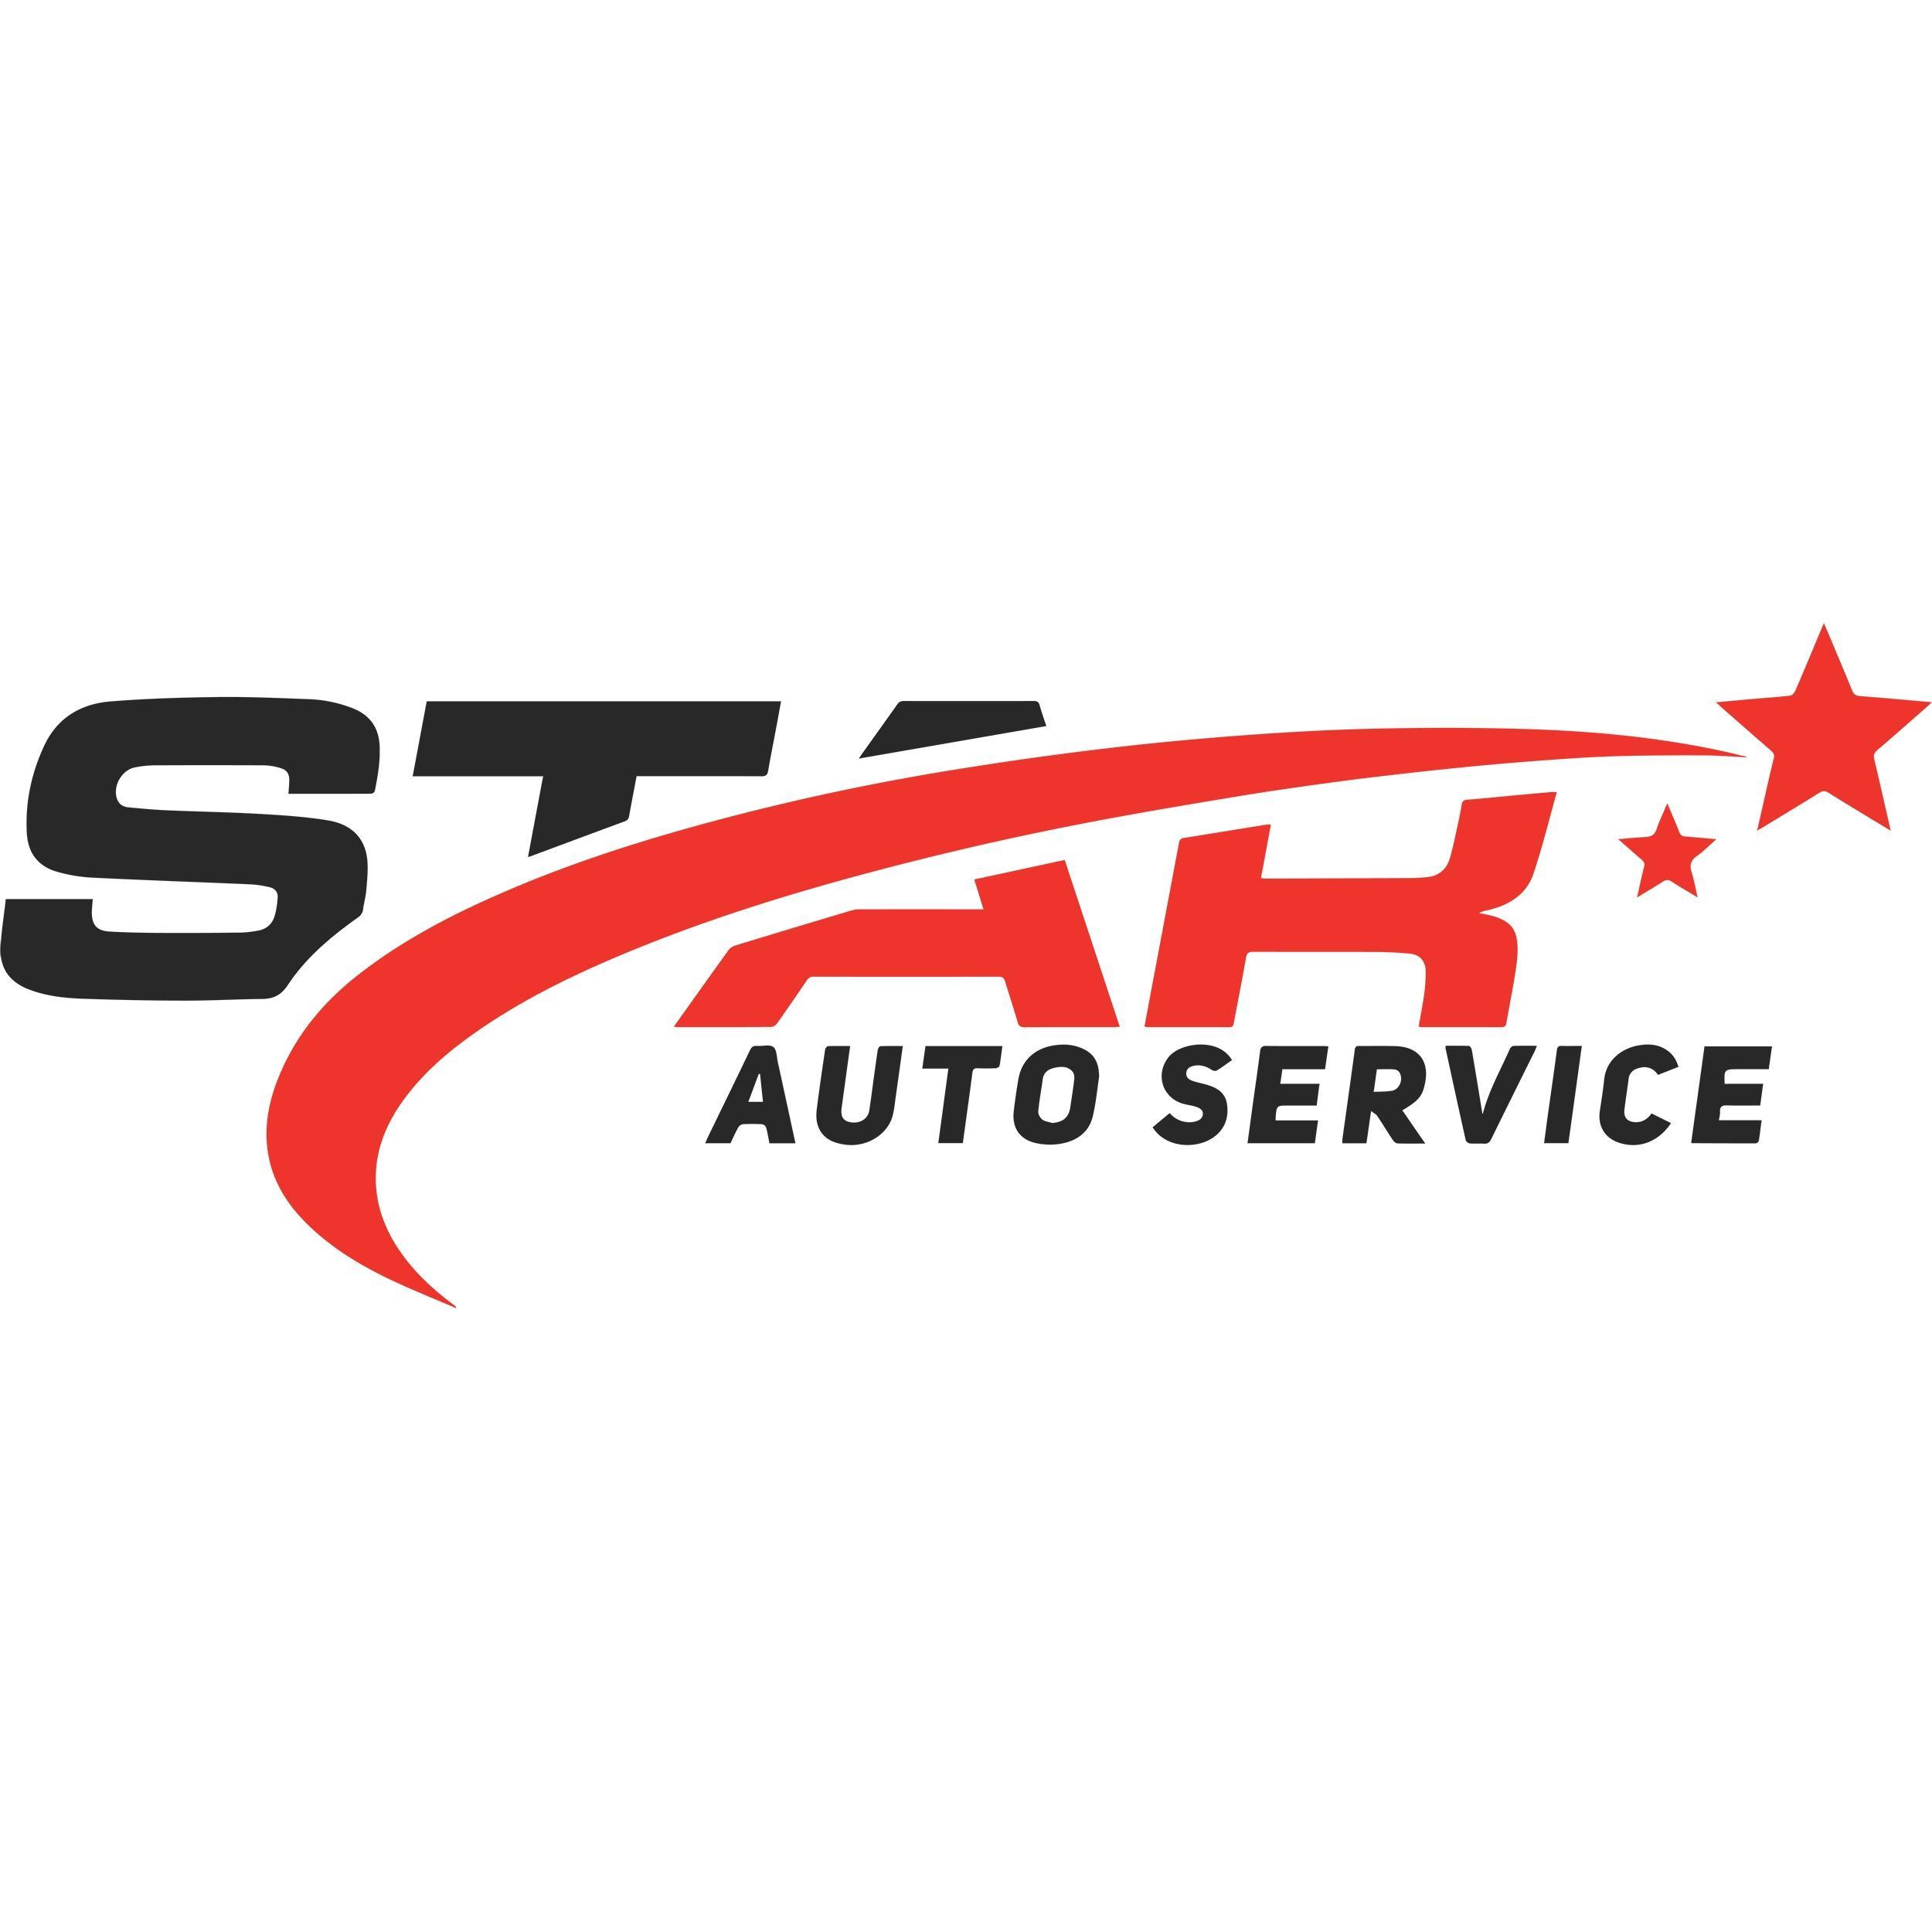 Star Auto Service image 6